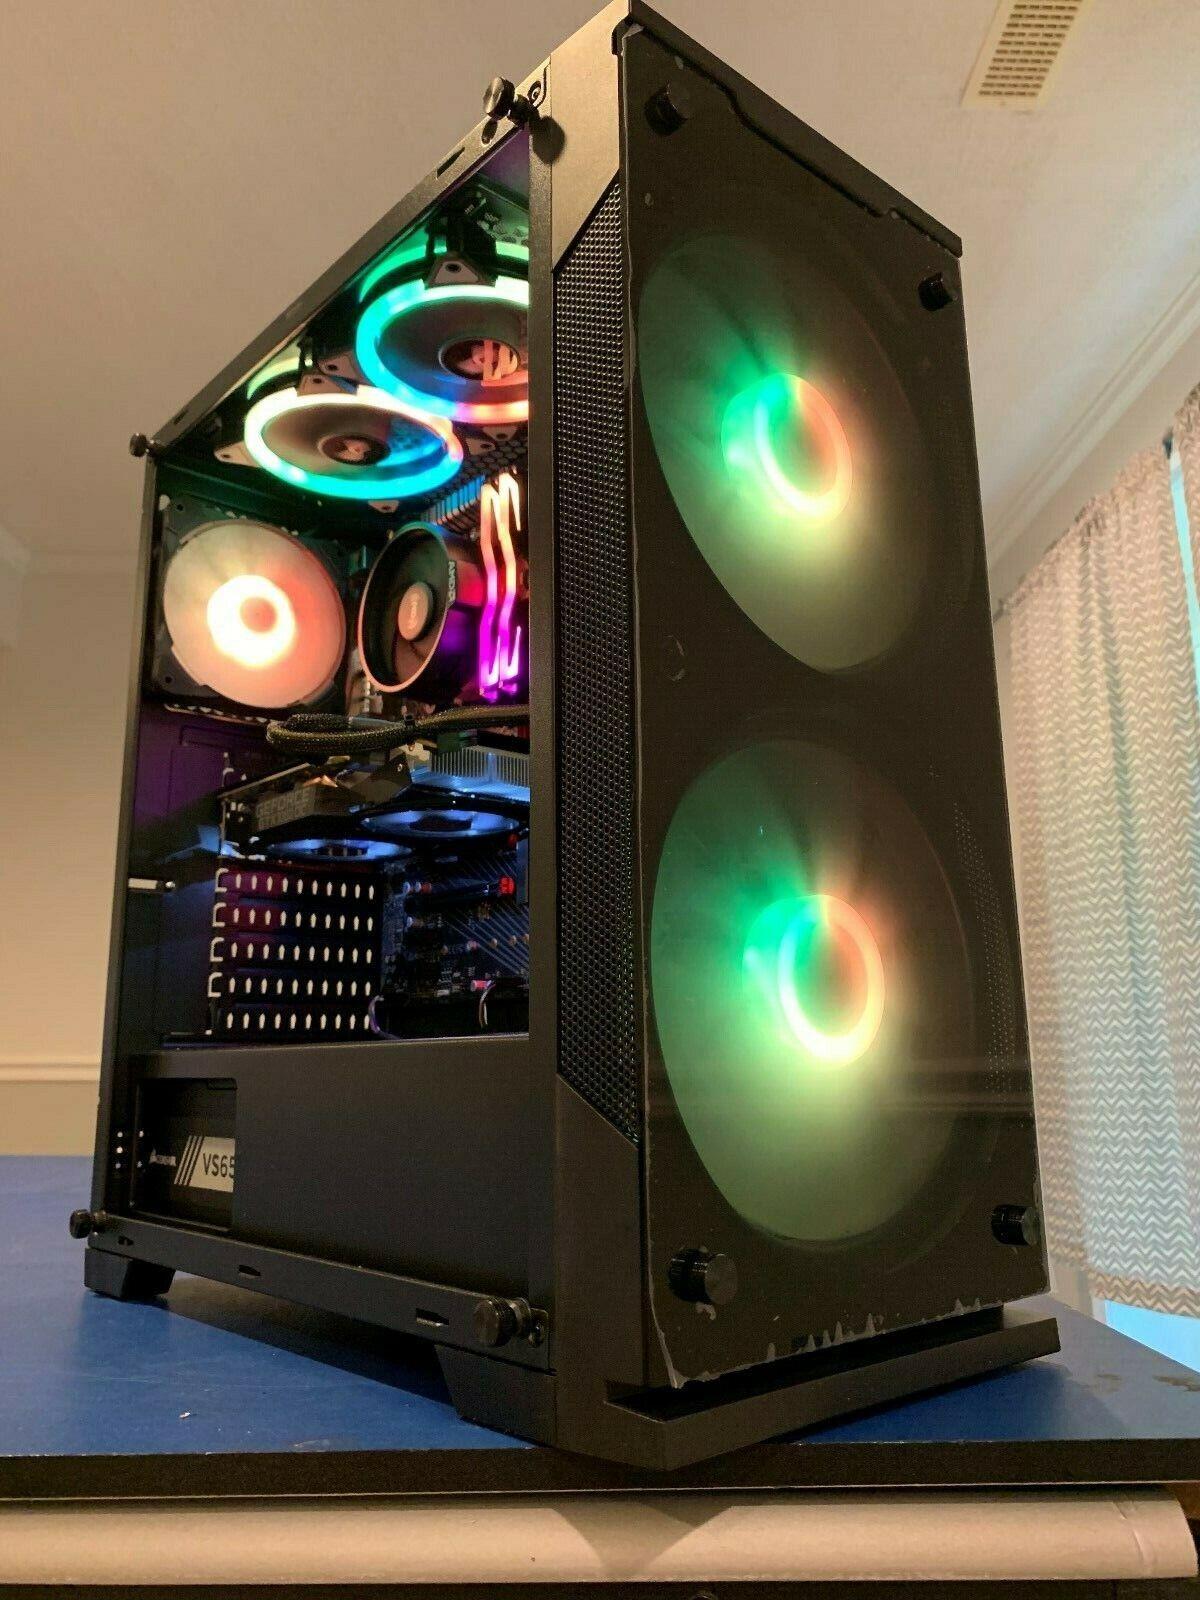 CUSTOM BUILT GAMING COMPUTER/PC RYZEN 4-CORE GTX 1060 8GB DD